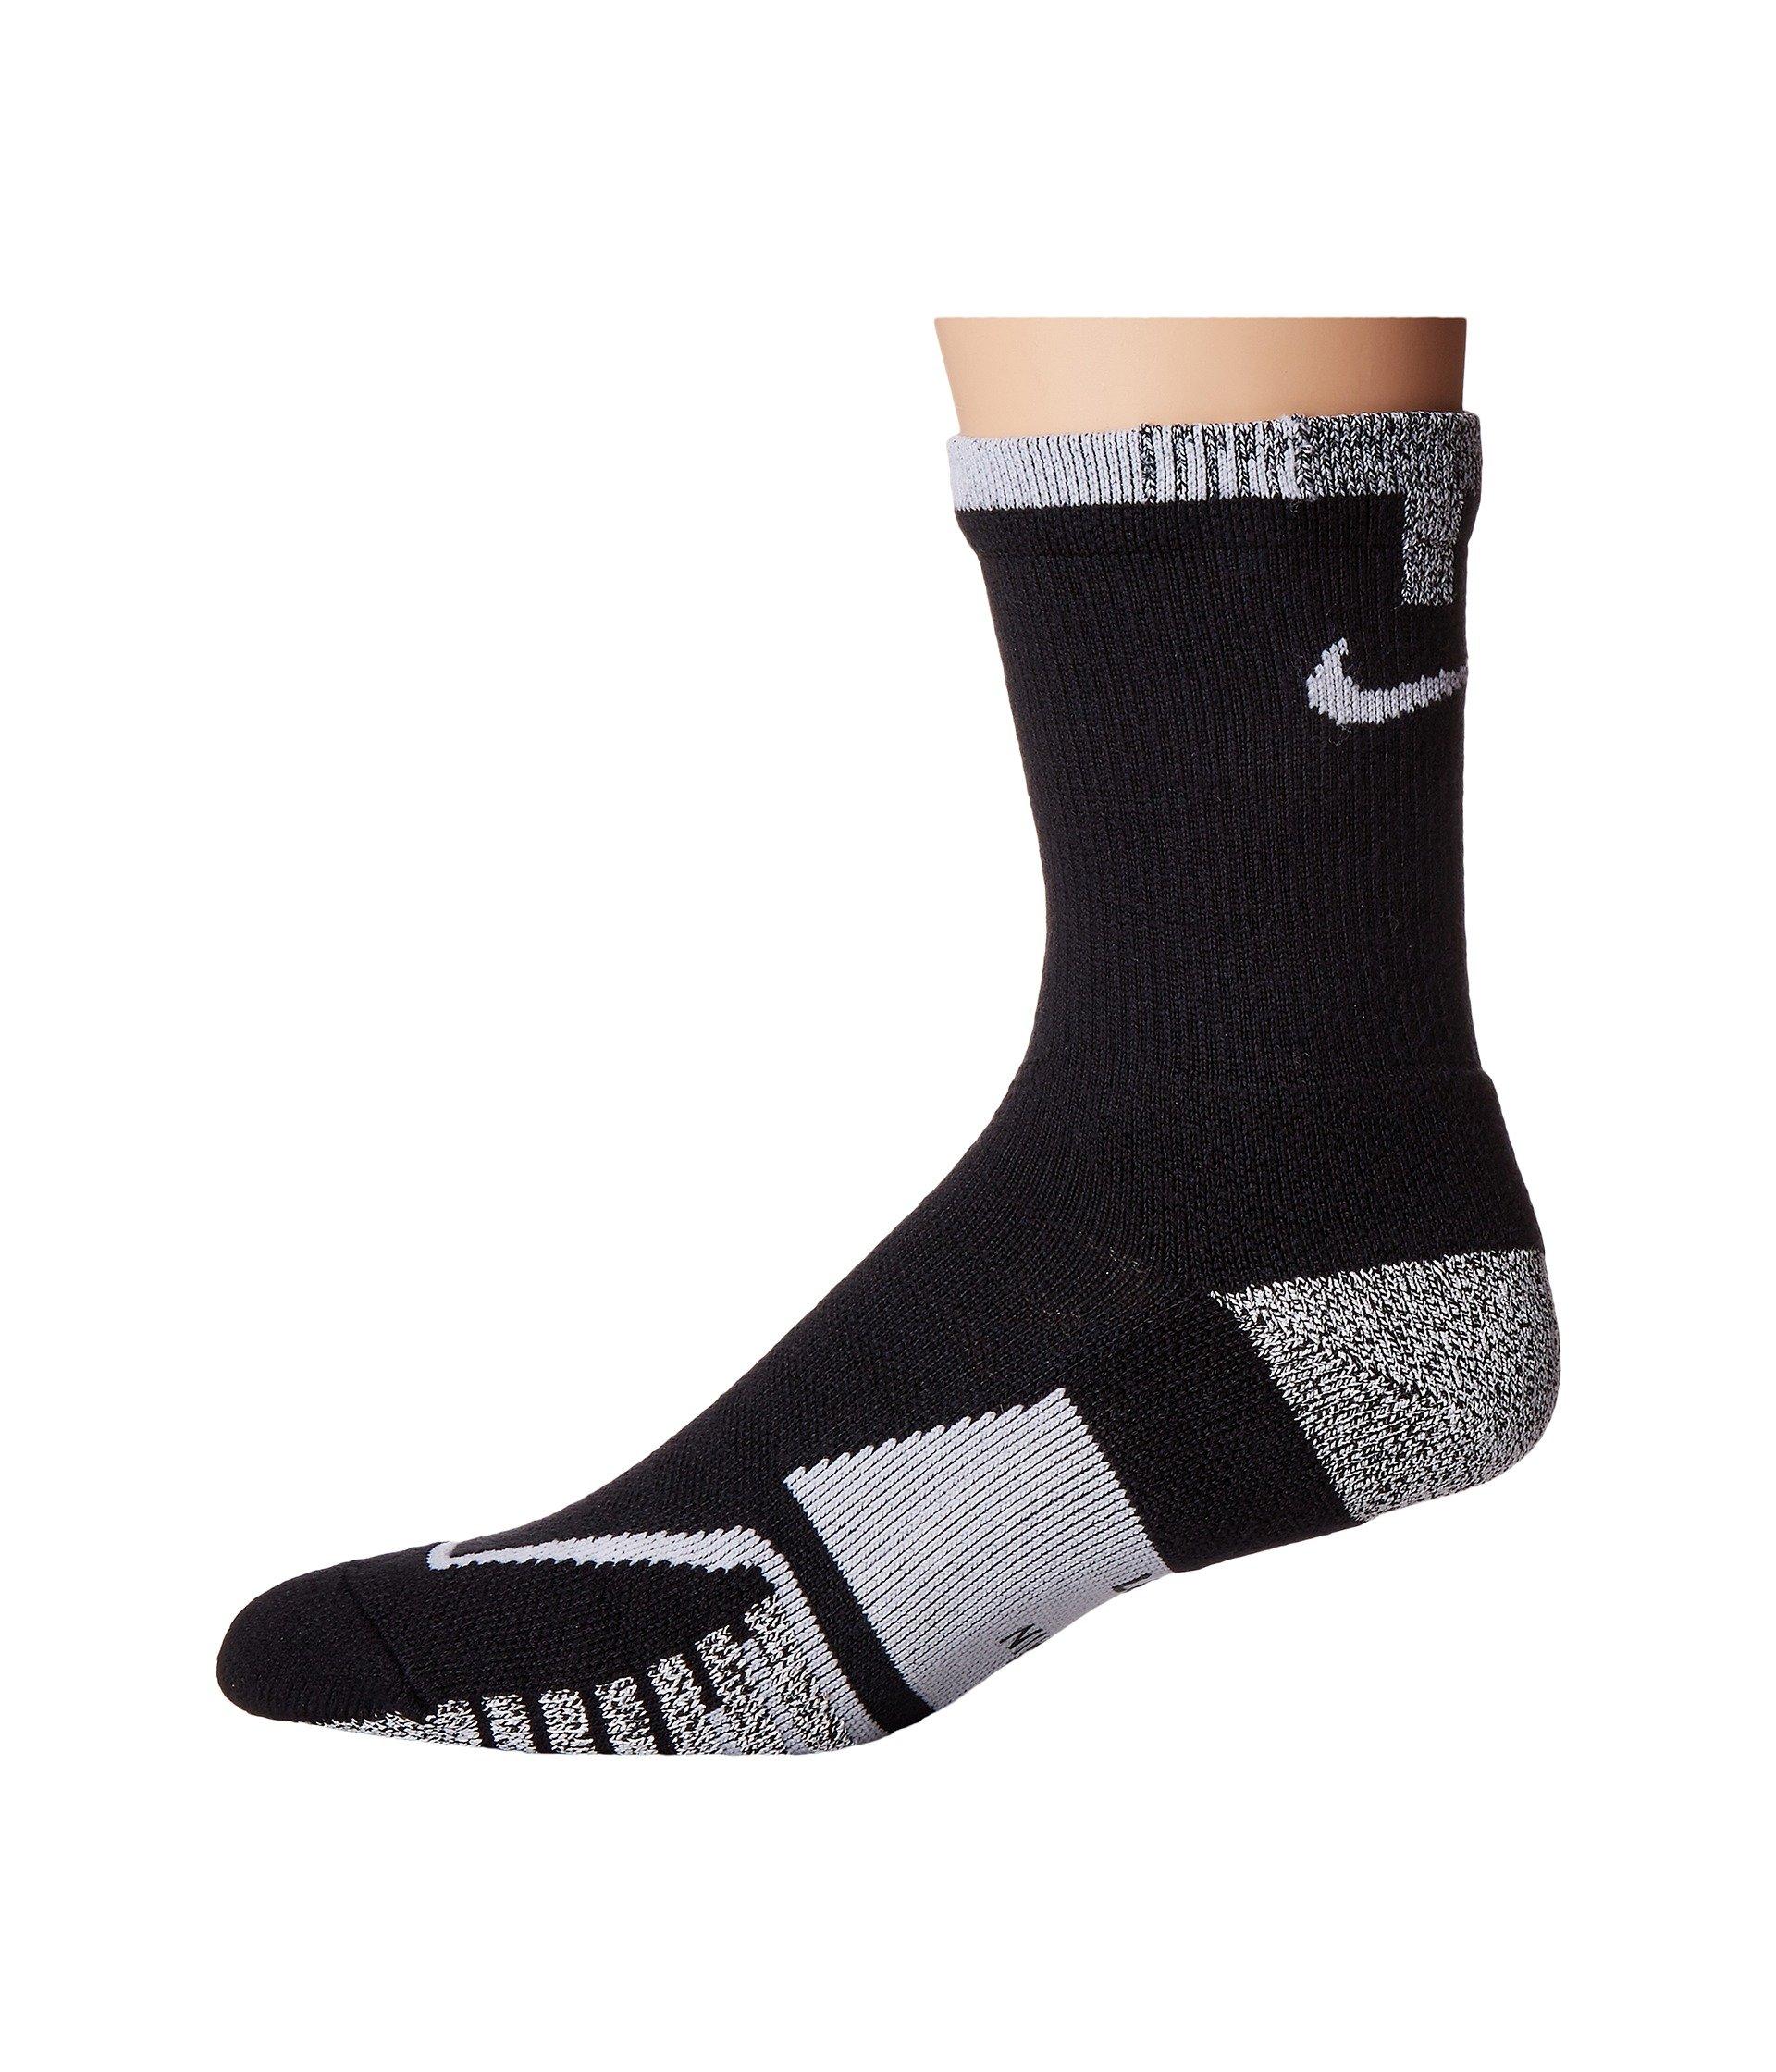 2baa89518c8d5 Nikegrip Elite Crew Tennis Socks, Black/Black/White